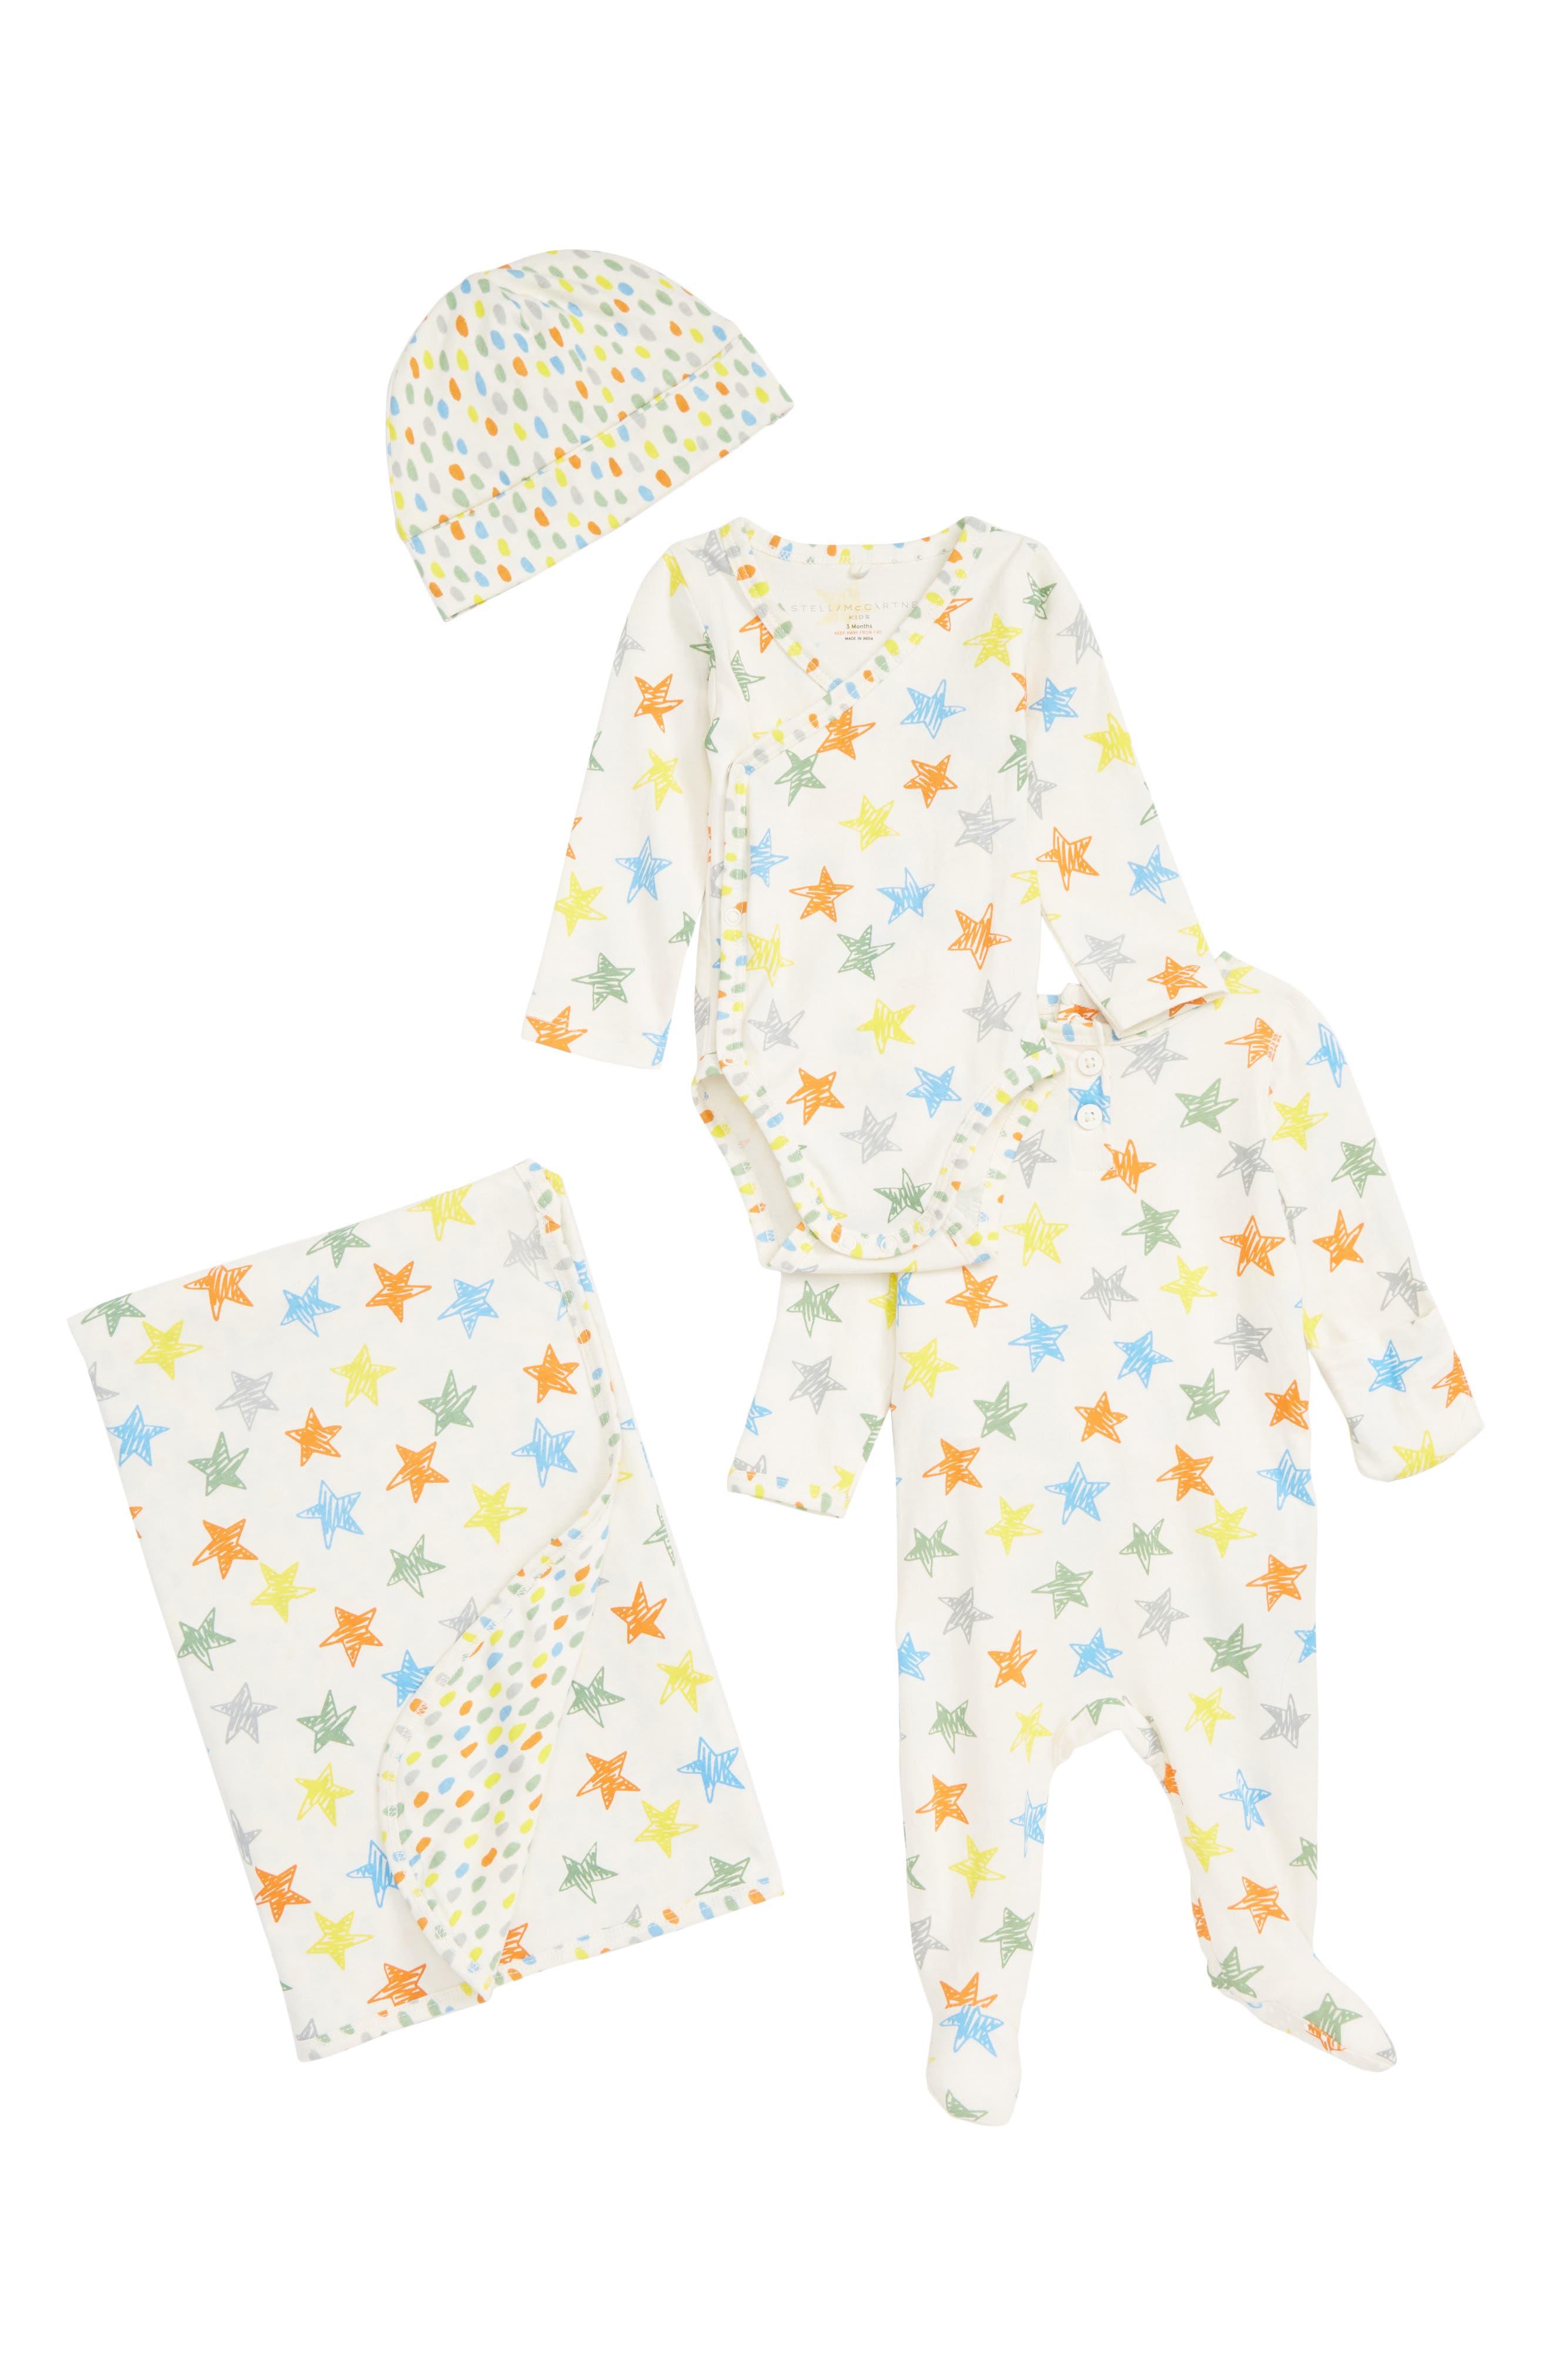 STELLA MCCARTNEY KIDS, Stella McCartney Organic Cotton Hat, Wrap Bodysuit, Romper & Blanket Set, Main thumbnail 1, color, MULTI